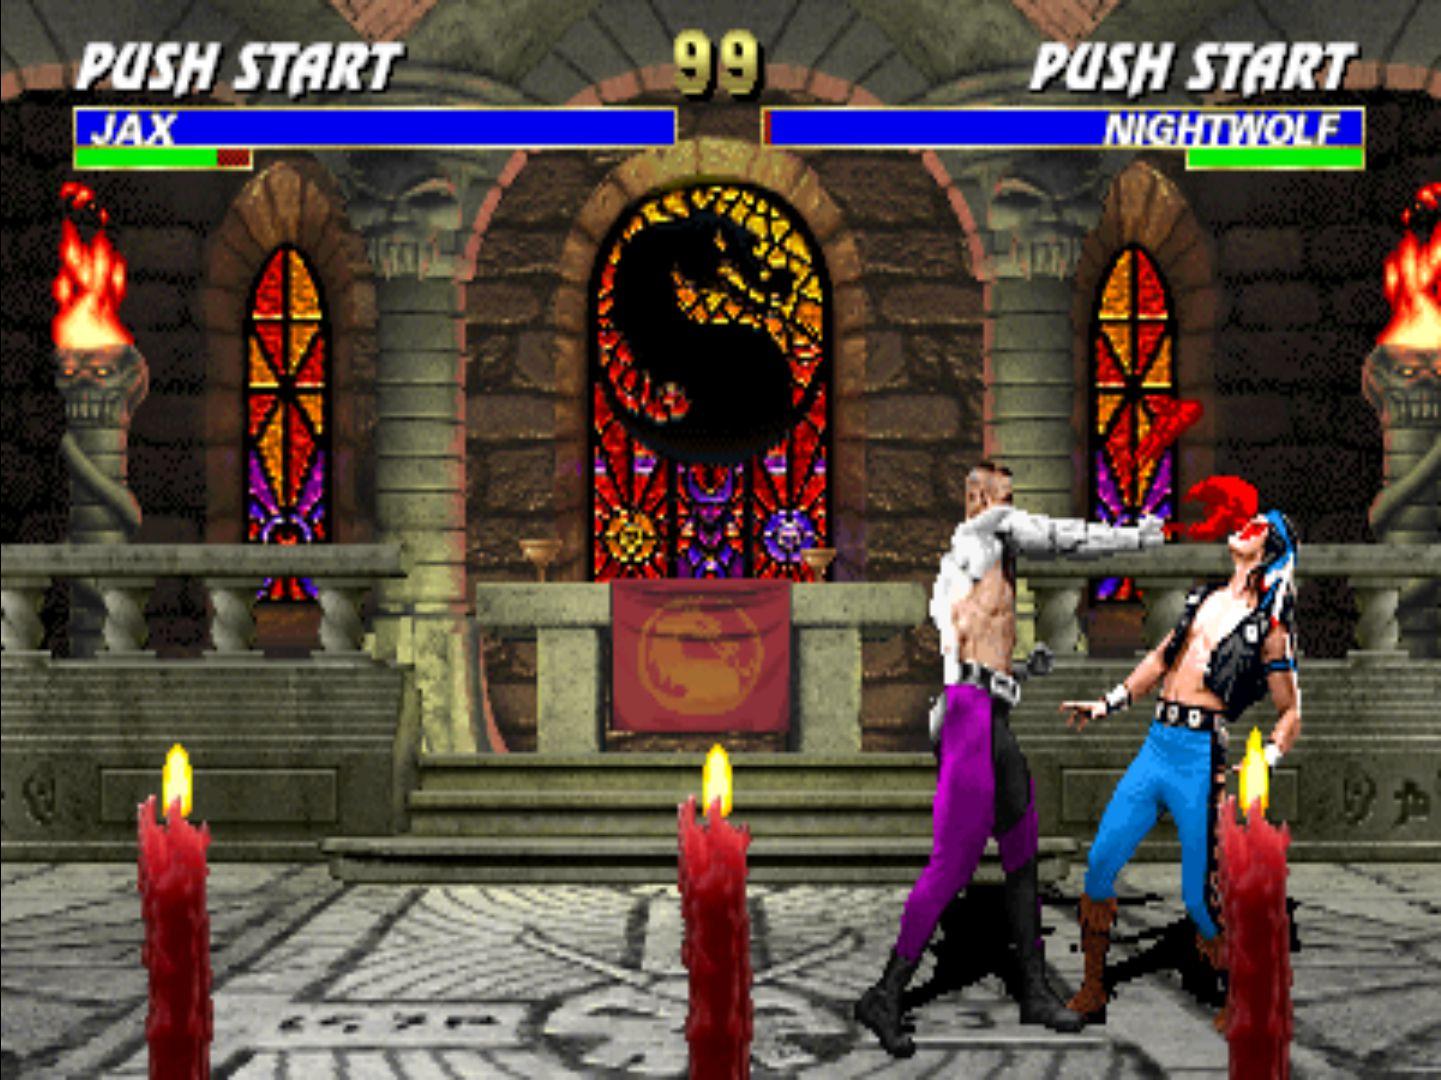 Ultimate Mortal Kombat 3 Download - Old Games Download